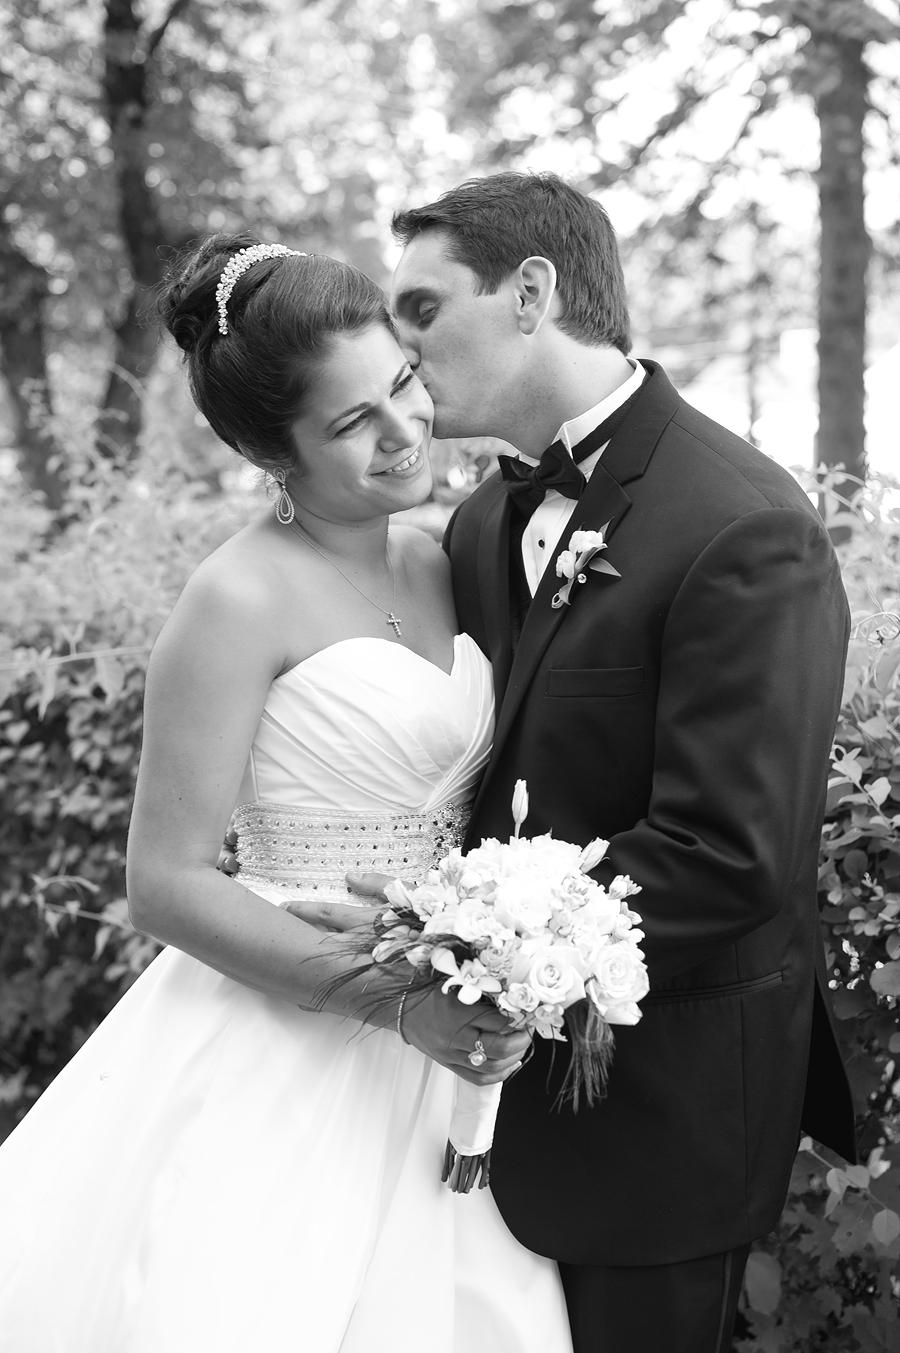 Maineweddingphotographer-39.original.full